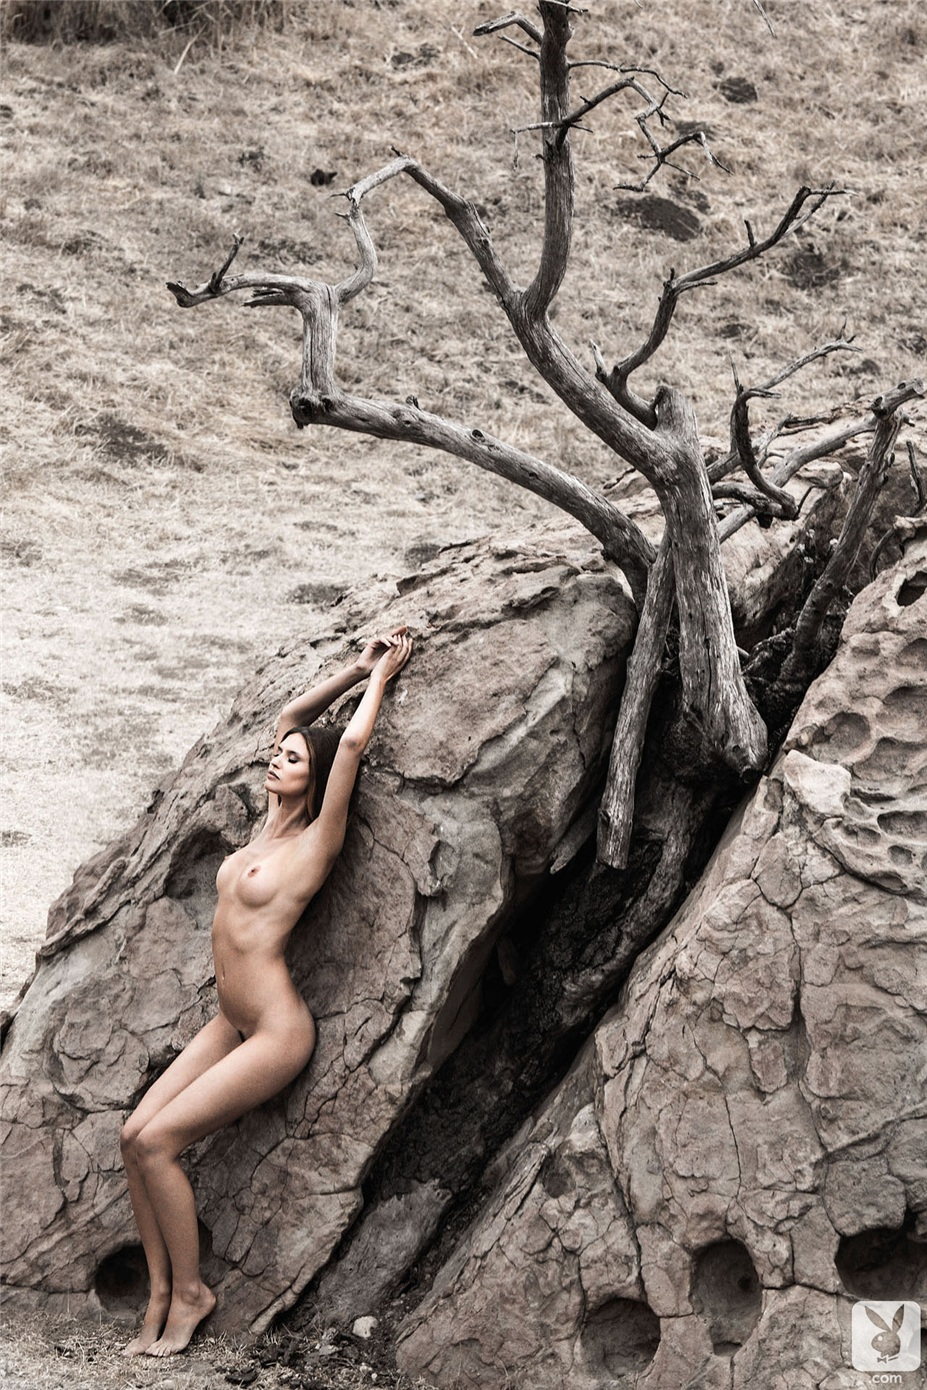 Бьянка Балти / Bianca Balti by Greg Lotus in US Playboy july/august 2014